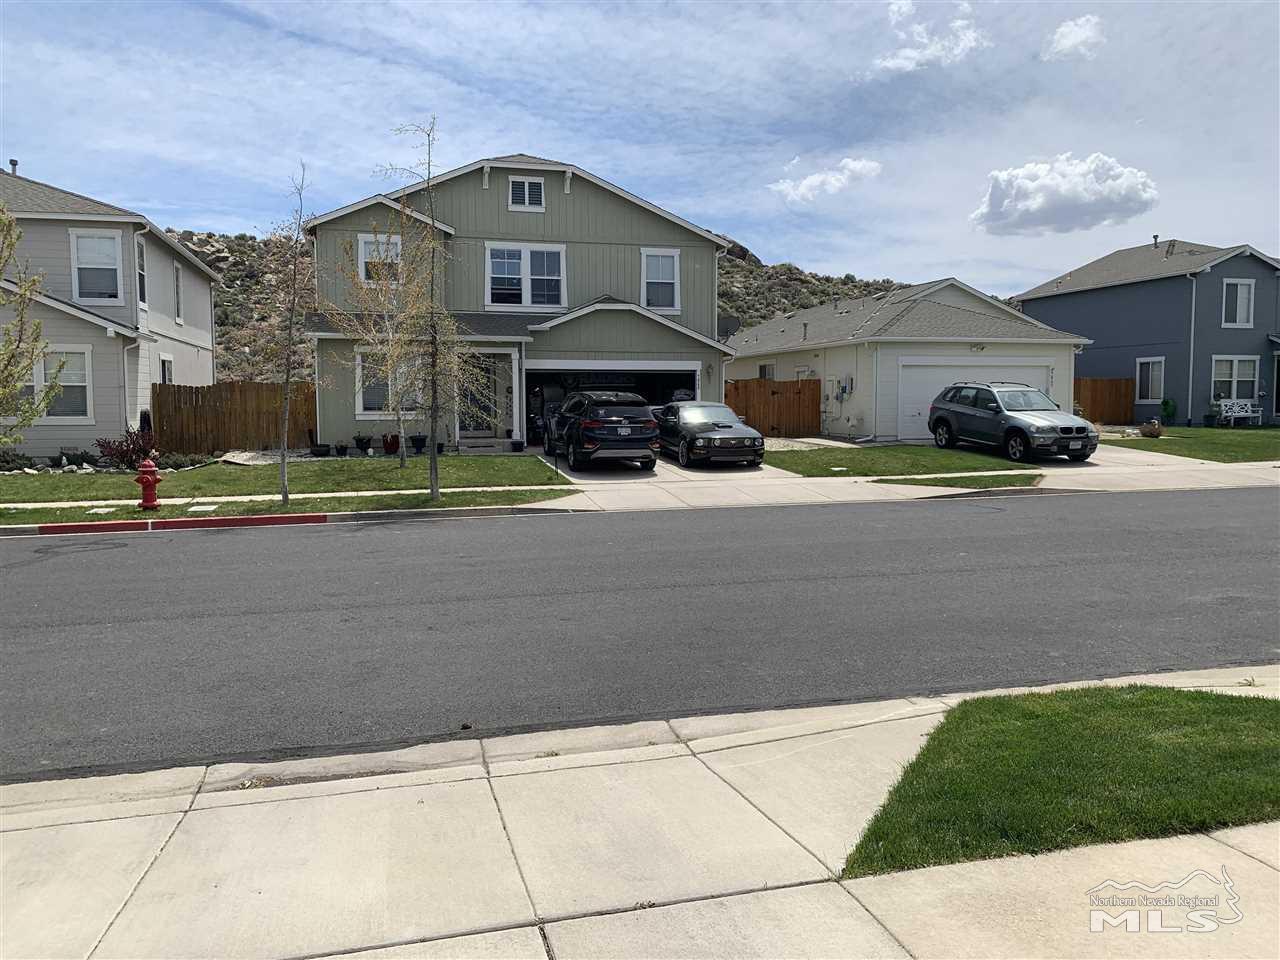 Image for 7648 Corso Street, Reno, NV 89506